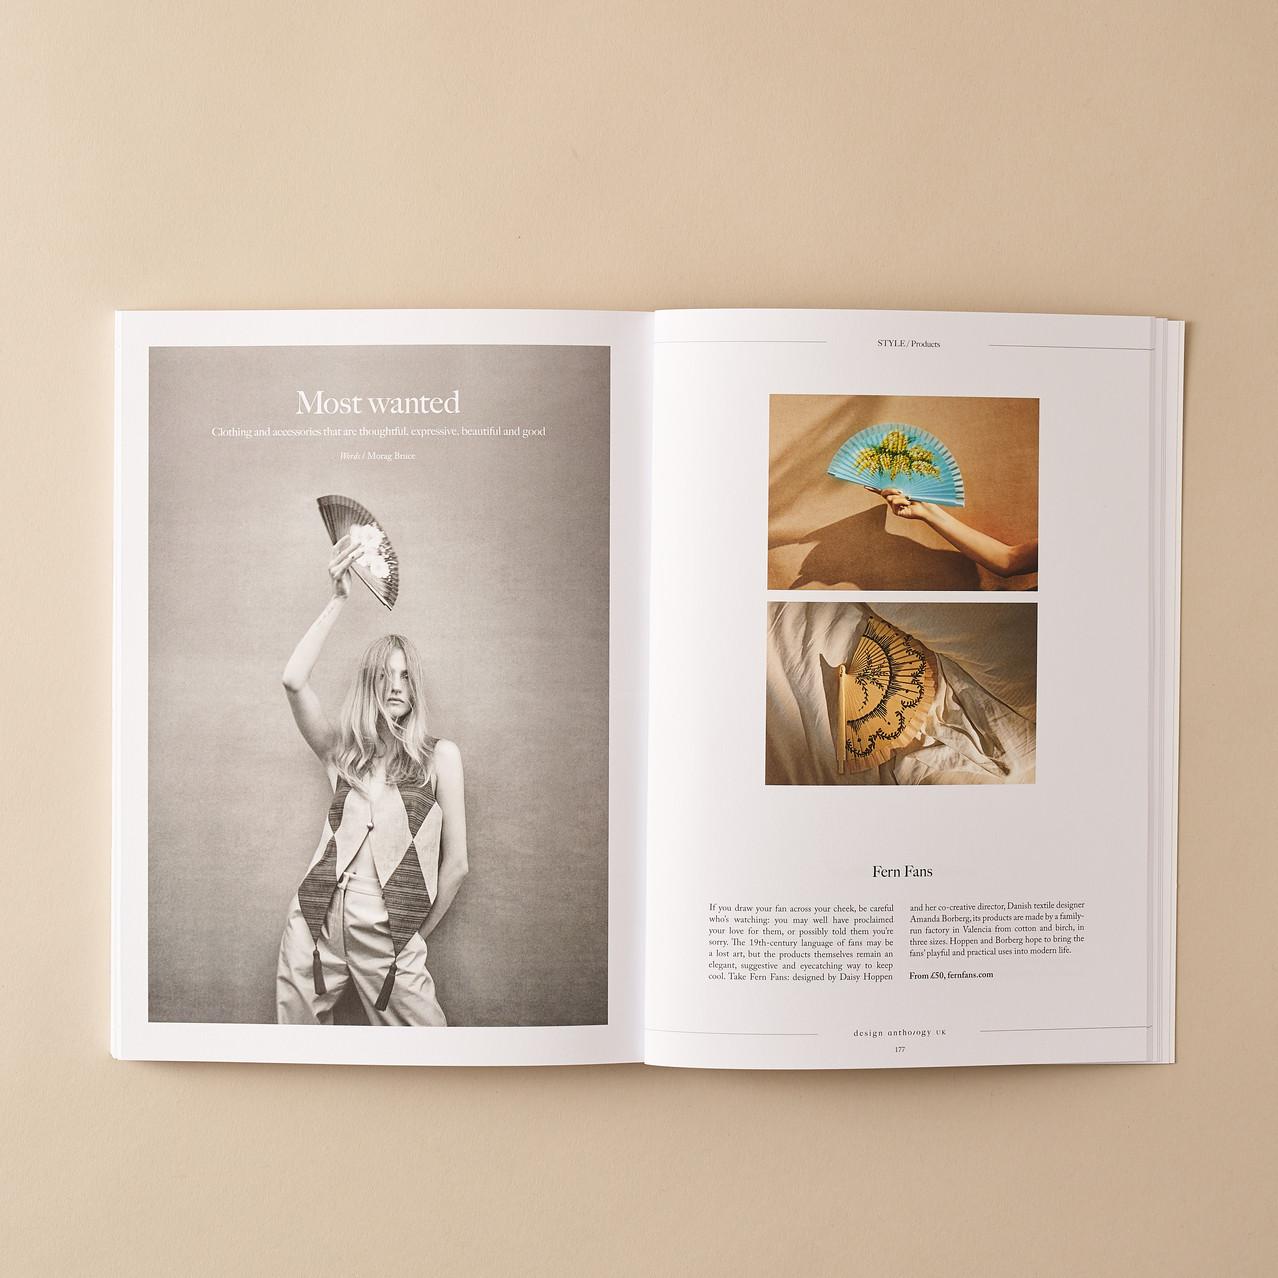 Design-Anthology-12.11.185271